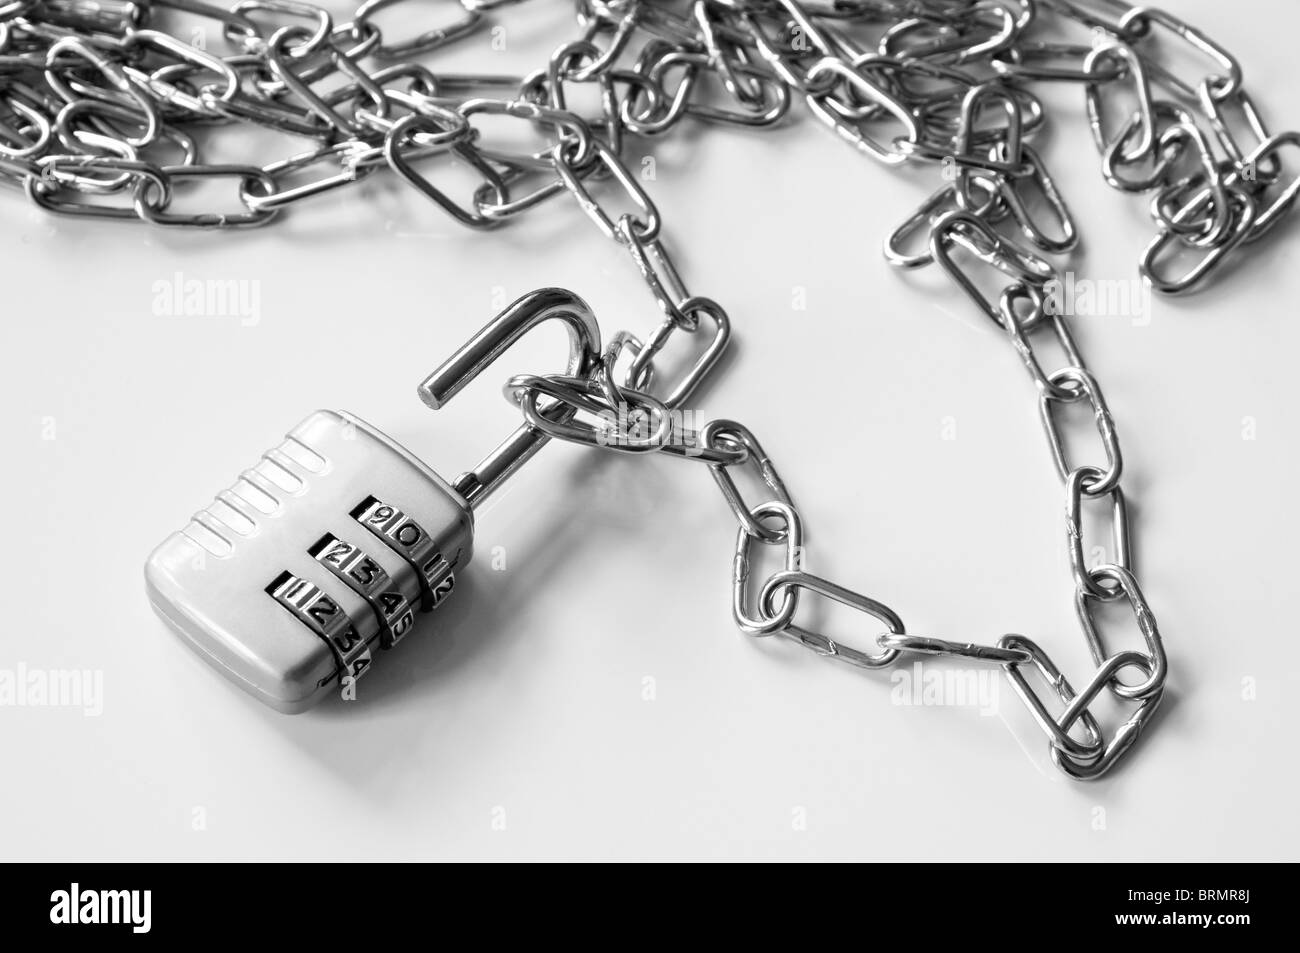 Unlocking a chain. - Stock Image